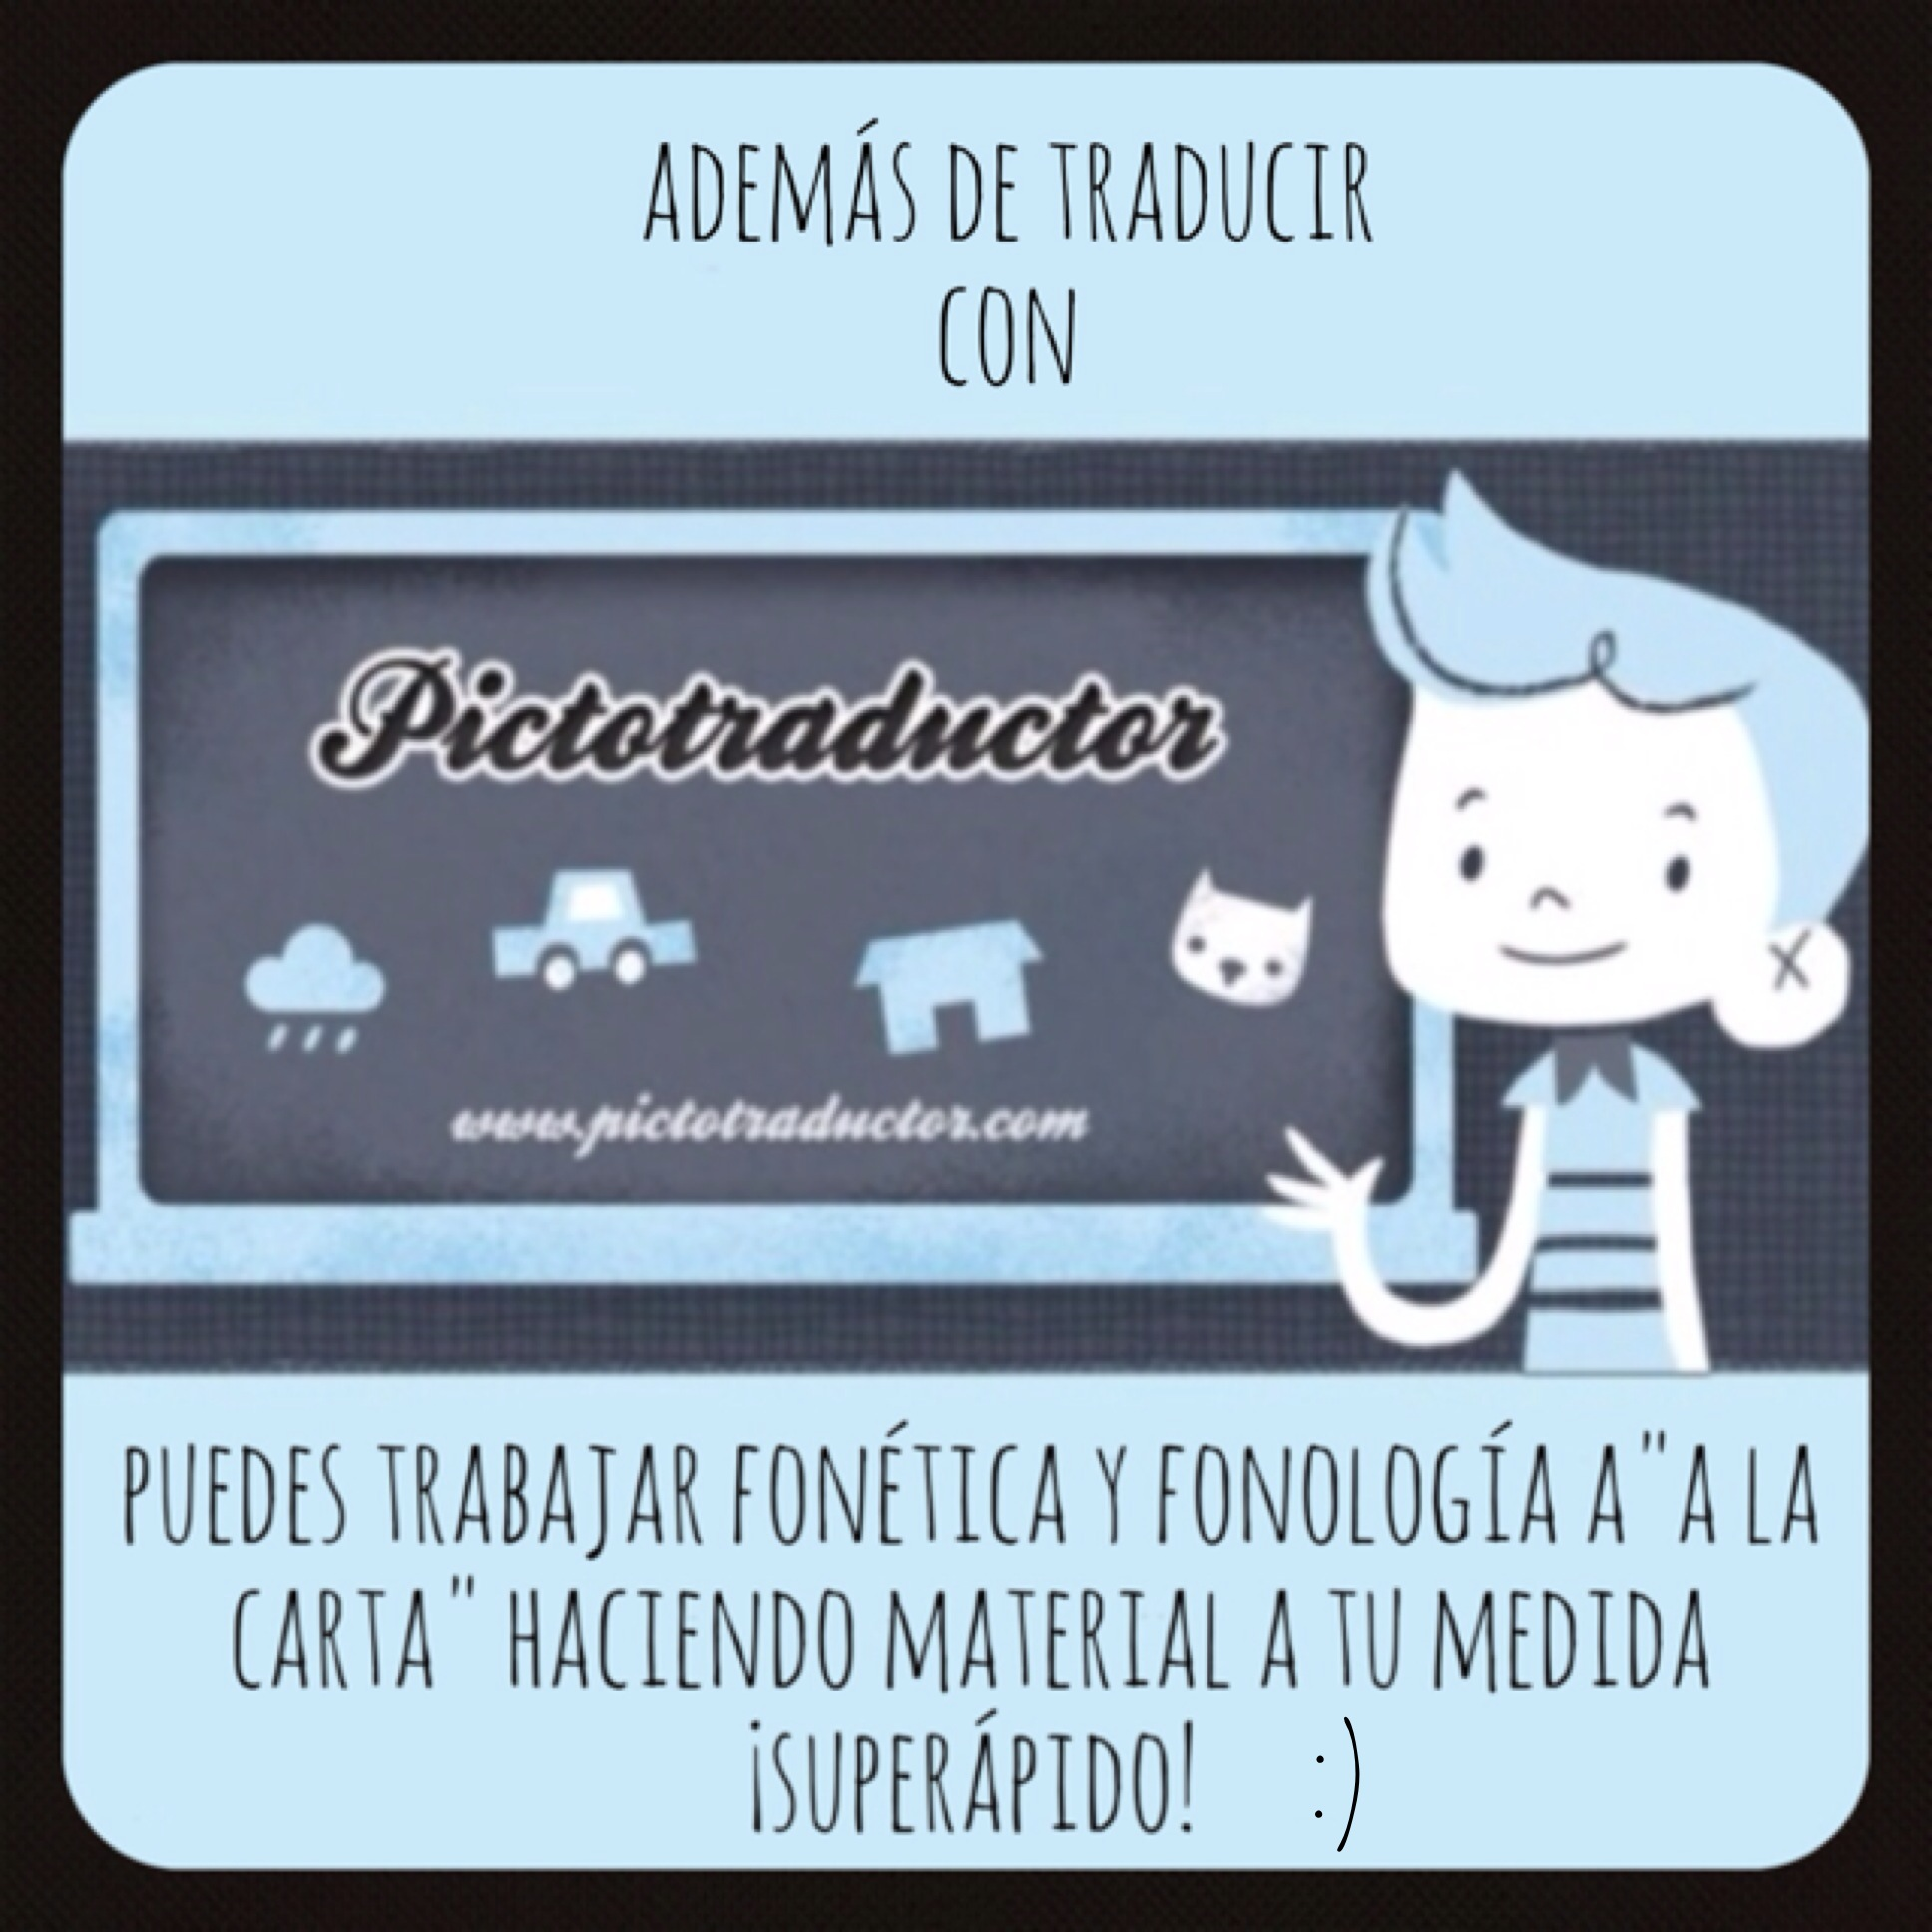 Pictotraductor